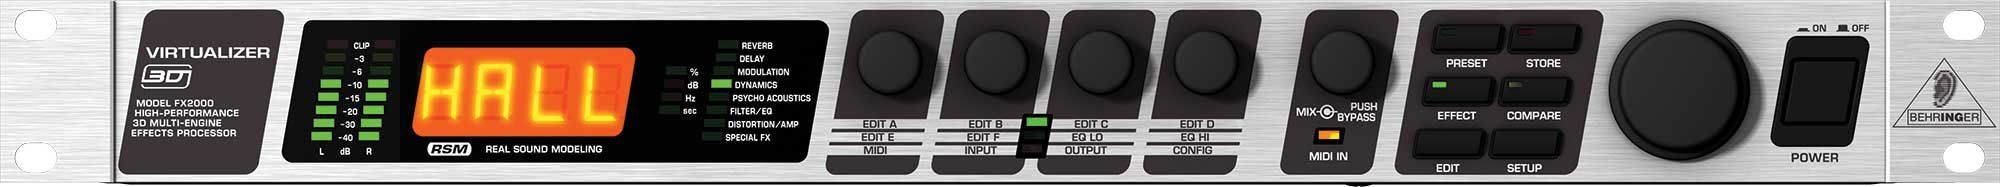 Behringer FX2000-VIRTUALIZER Multi-Effects Processor FX2000-VIRTUALIZER